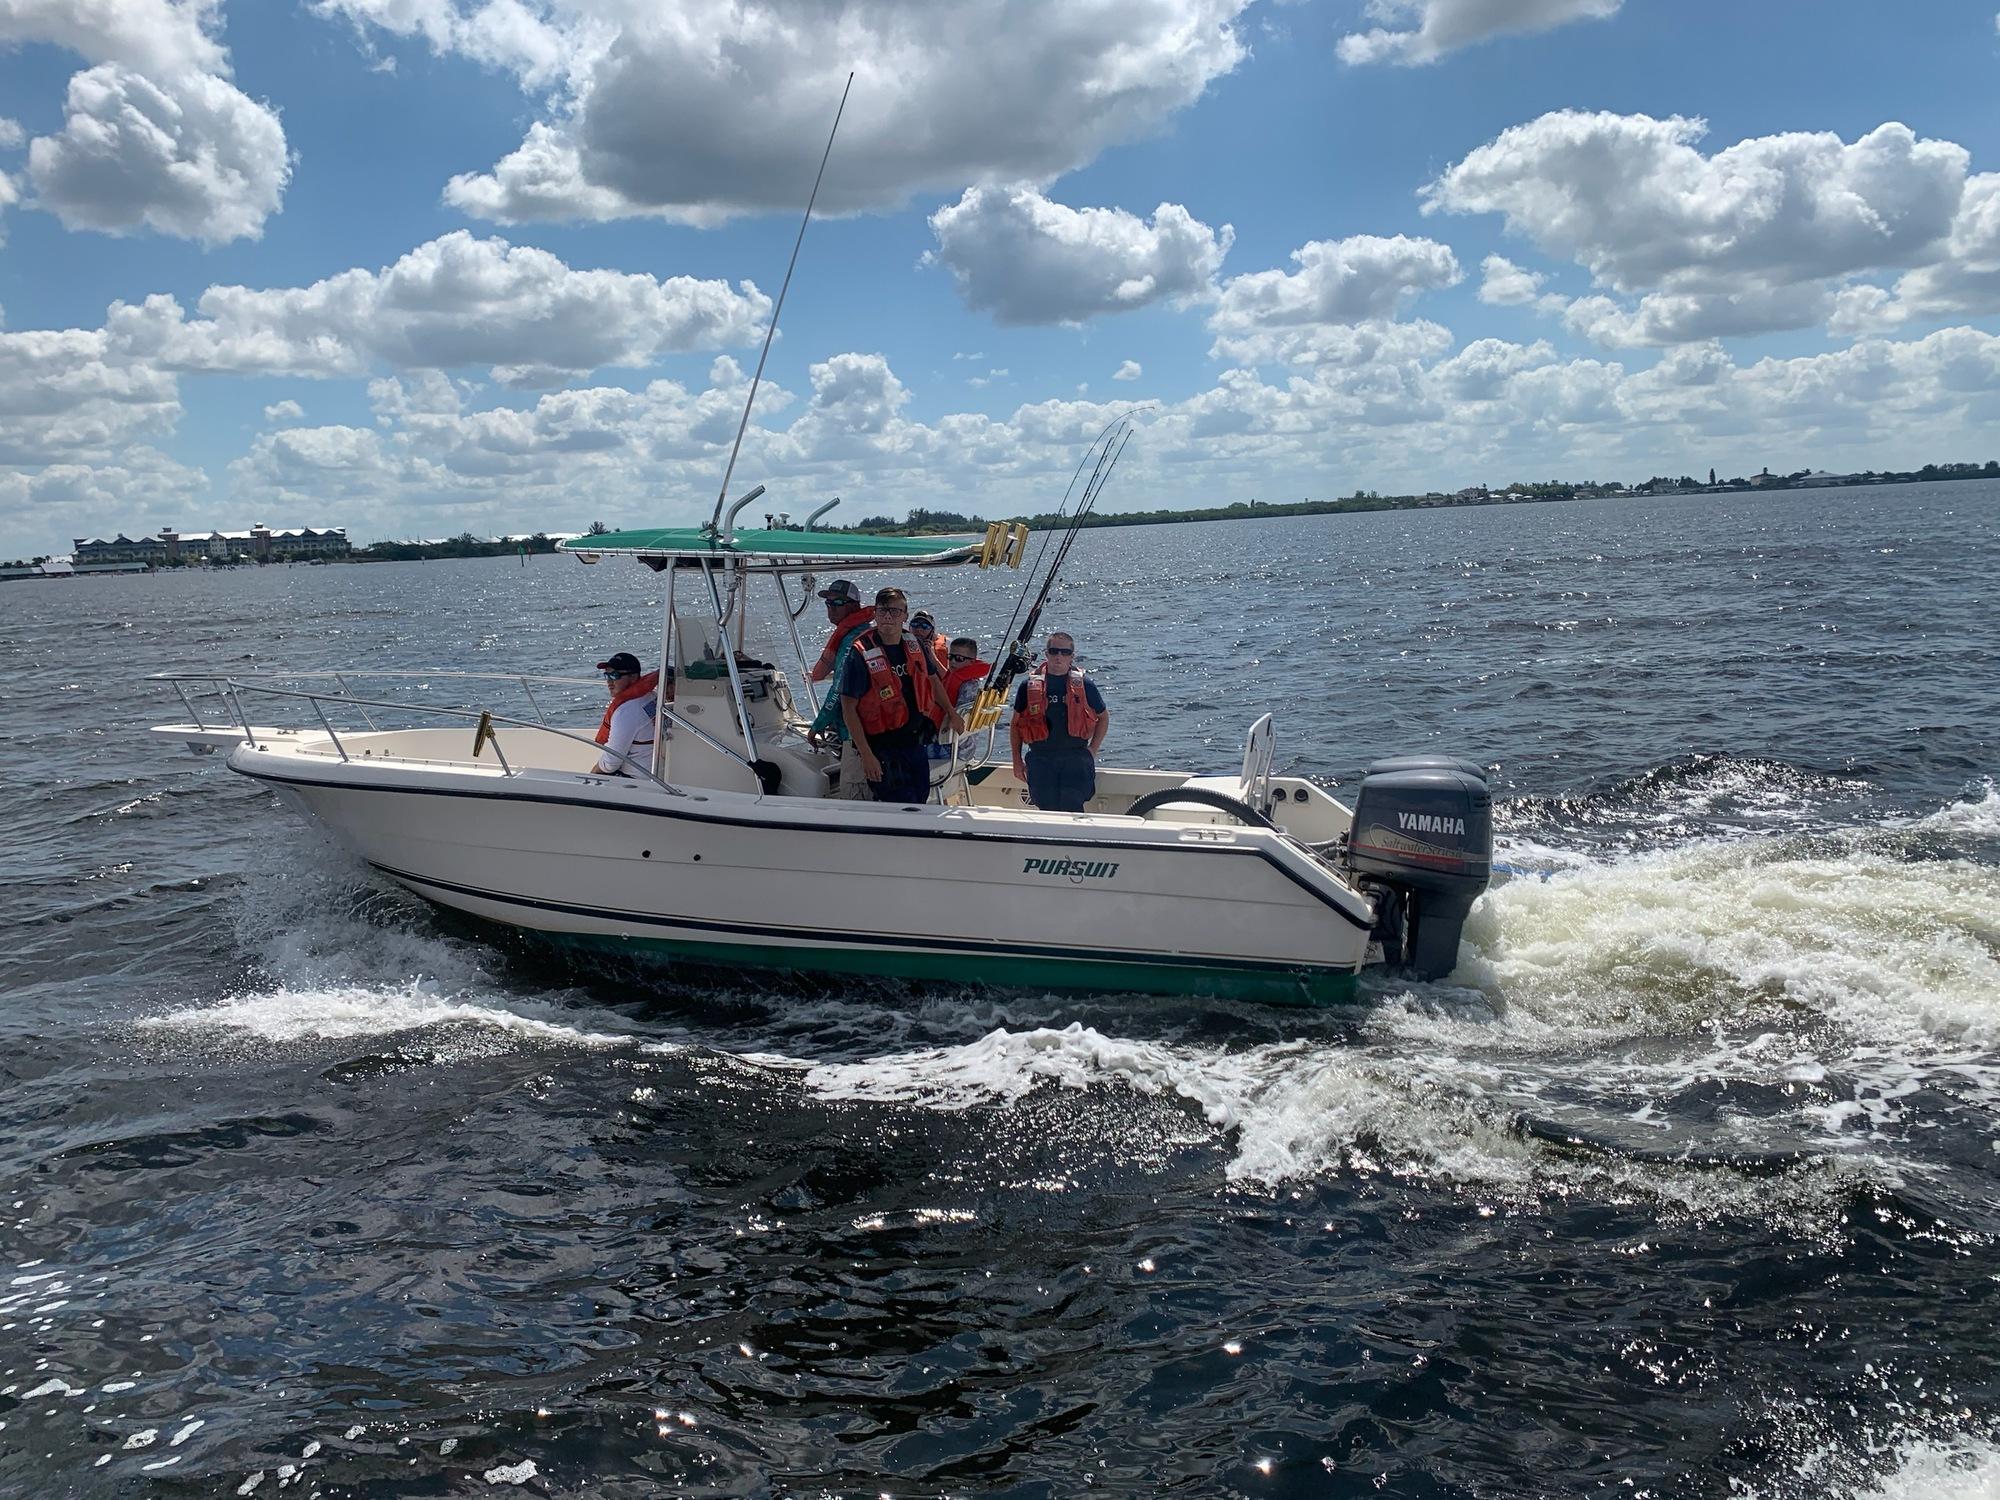 PHOTO RELEASE: Coast Guard assists 5 near Tampa Bay Skyway Bridge